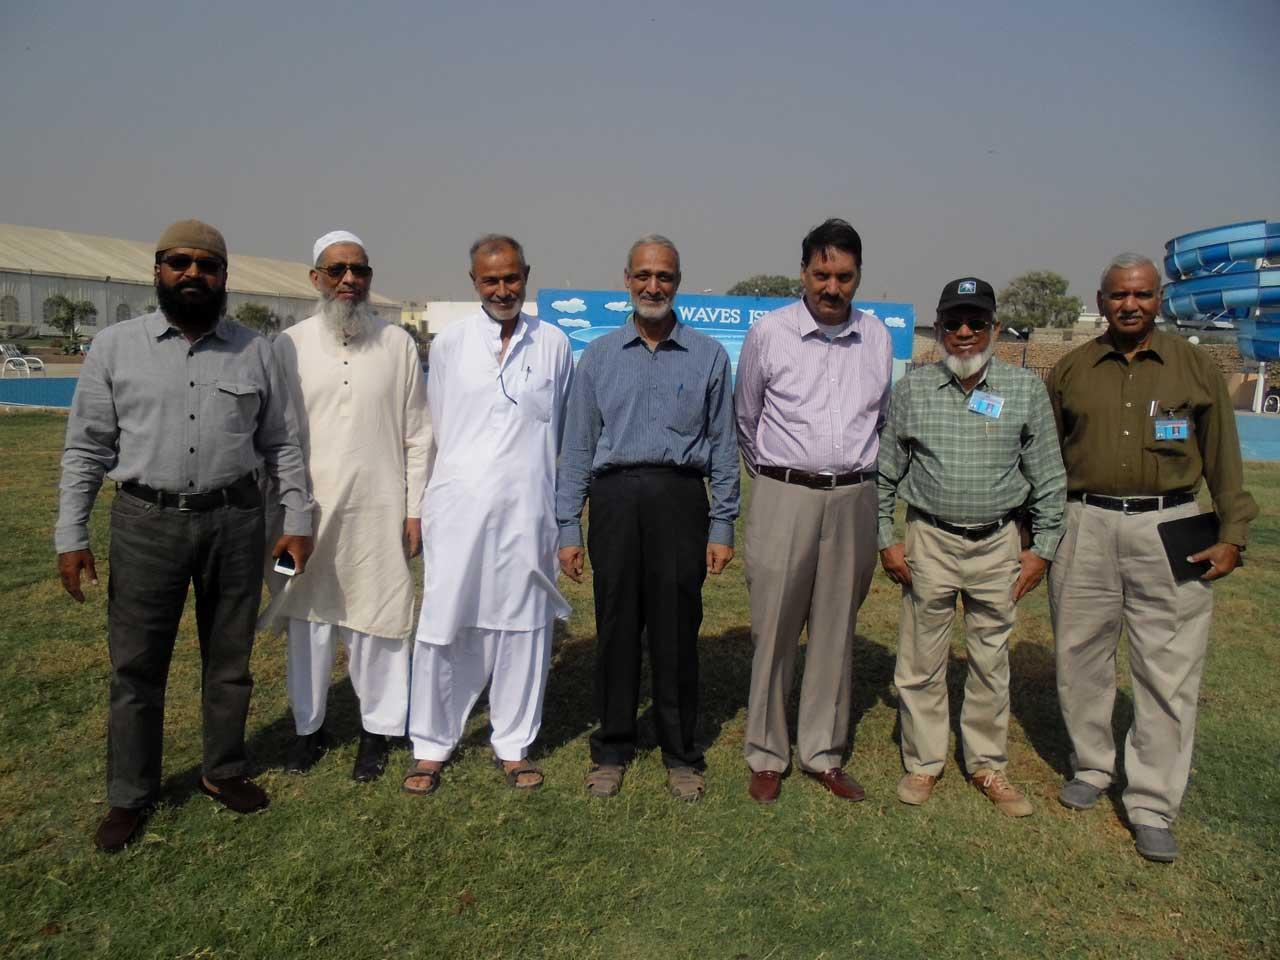 Qaiser Khan, Abu Iftikhar, Ahmed Jan, Qazi Naseer, Maqbool Hussain, Iqbal Khan, Qutubuddin Khan